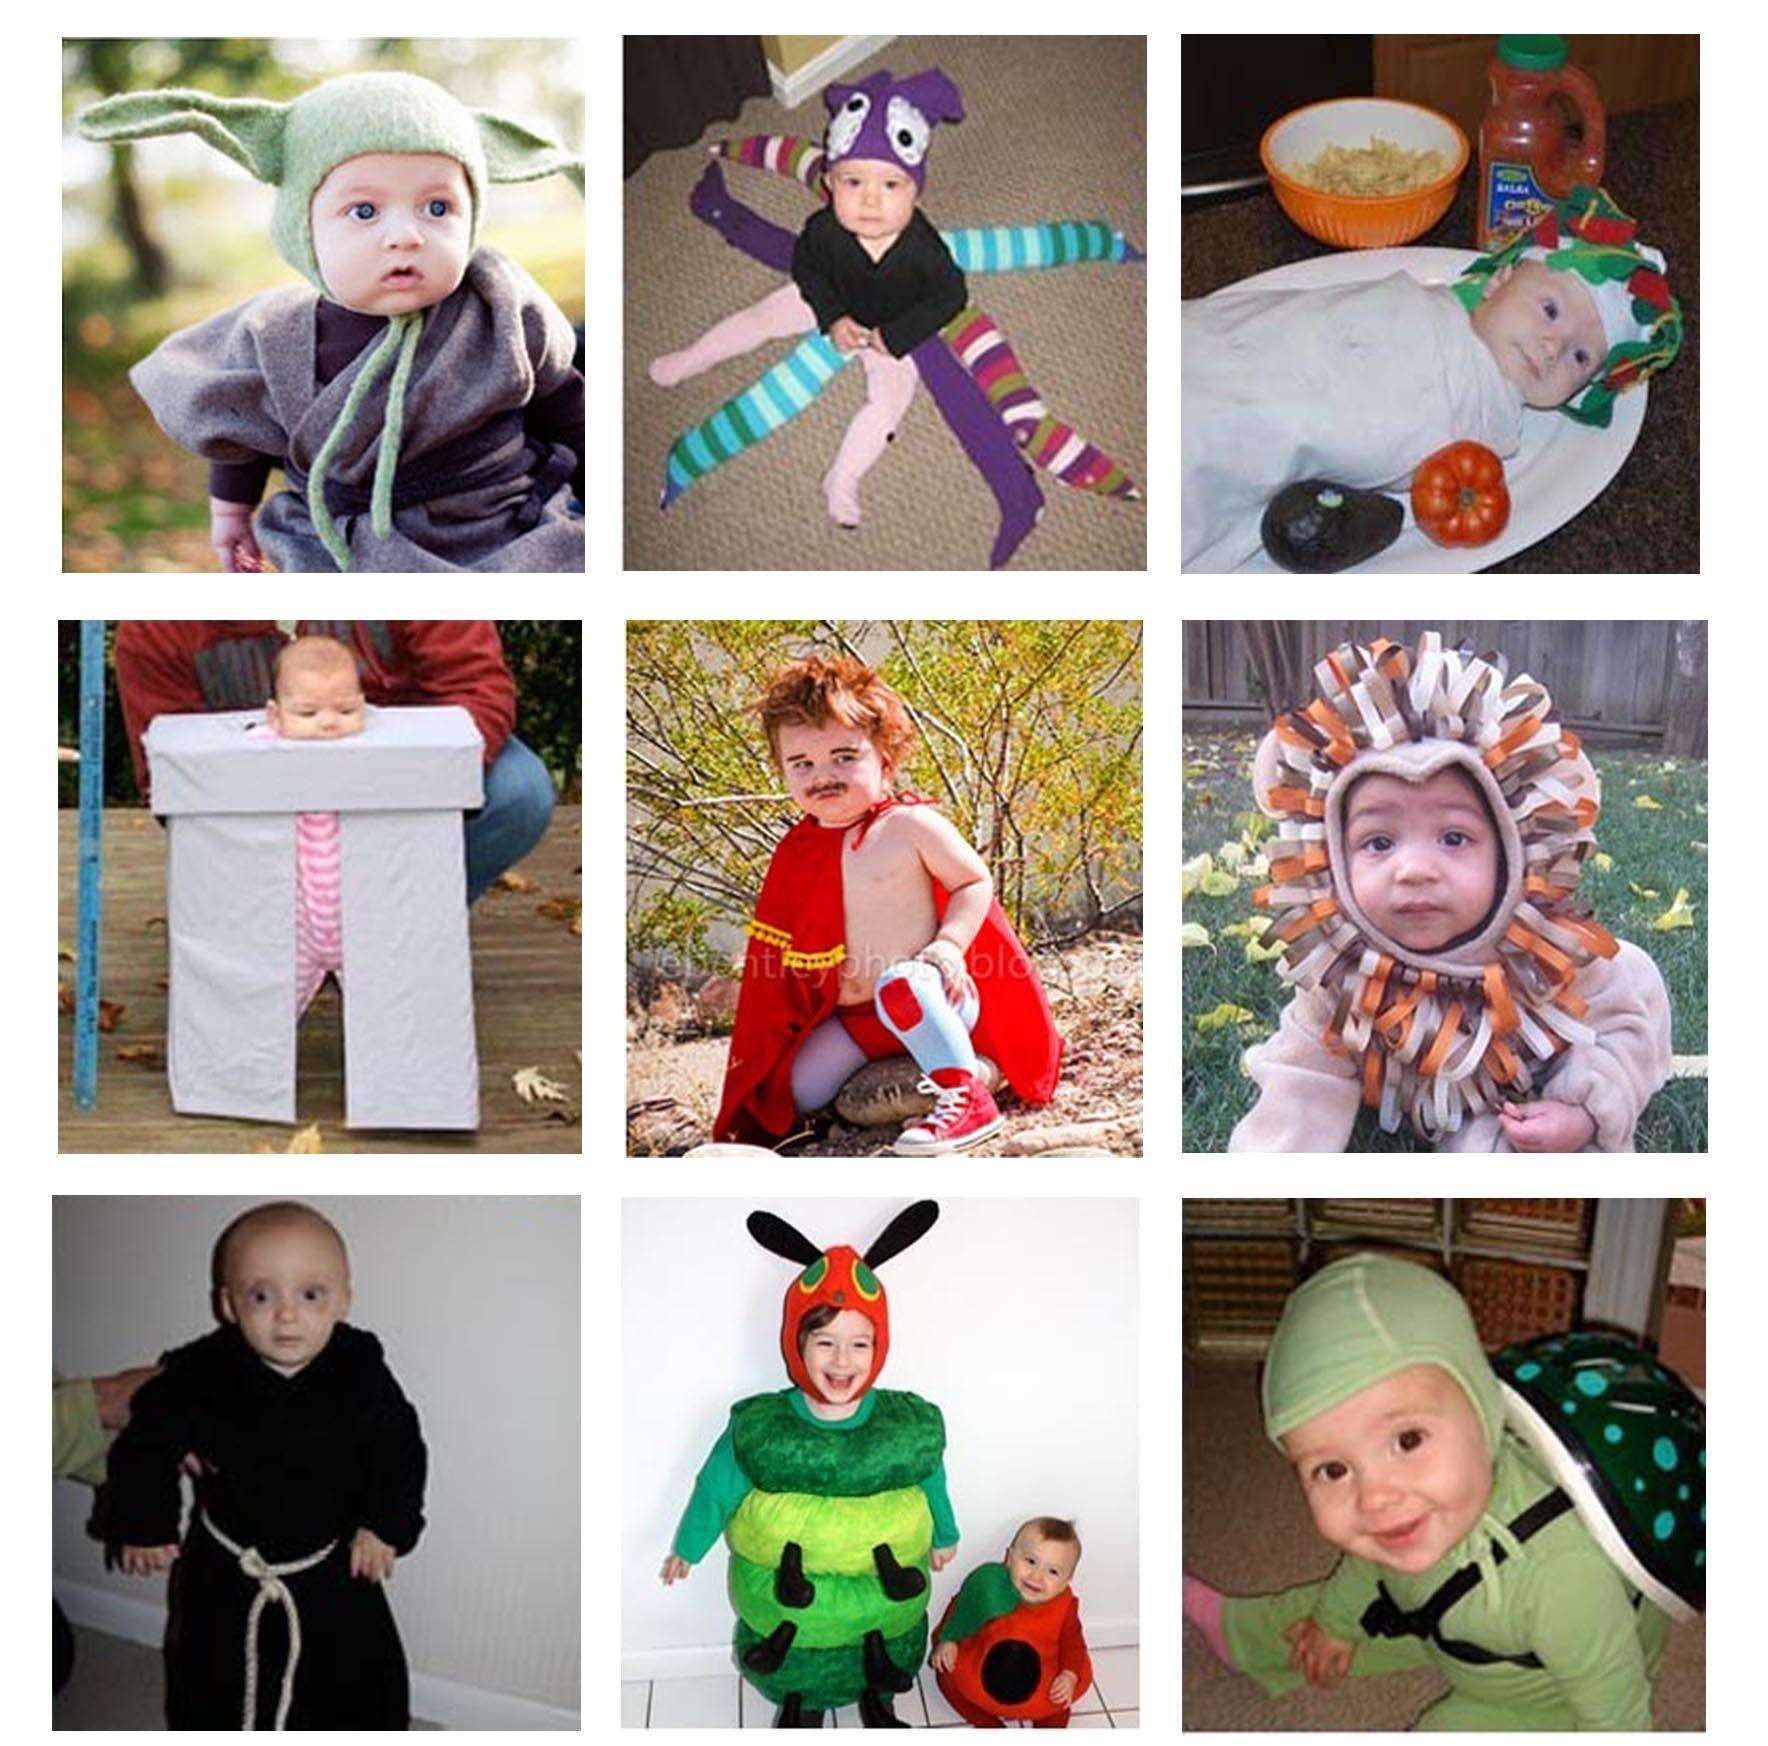 10 Great Kids Halloween Costume Ideas 2013 brilliantly creative and funny halloween costumes for kids http 2020